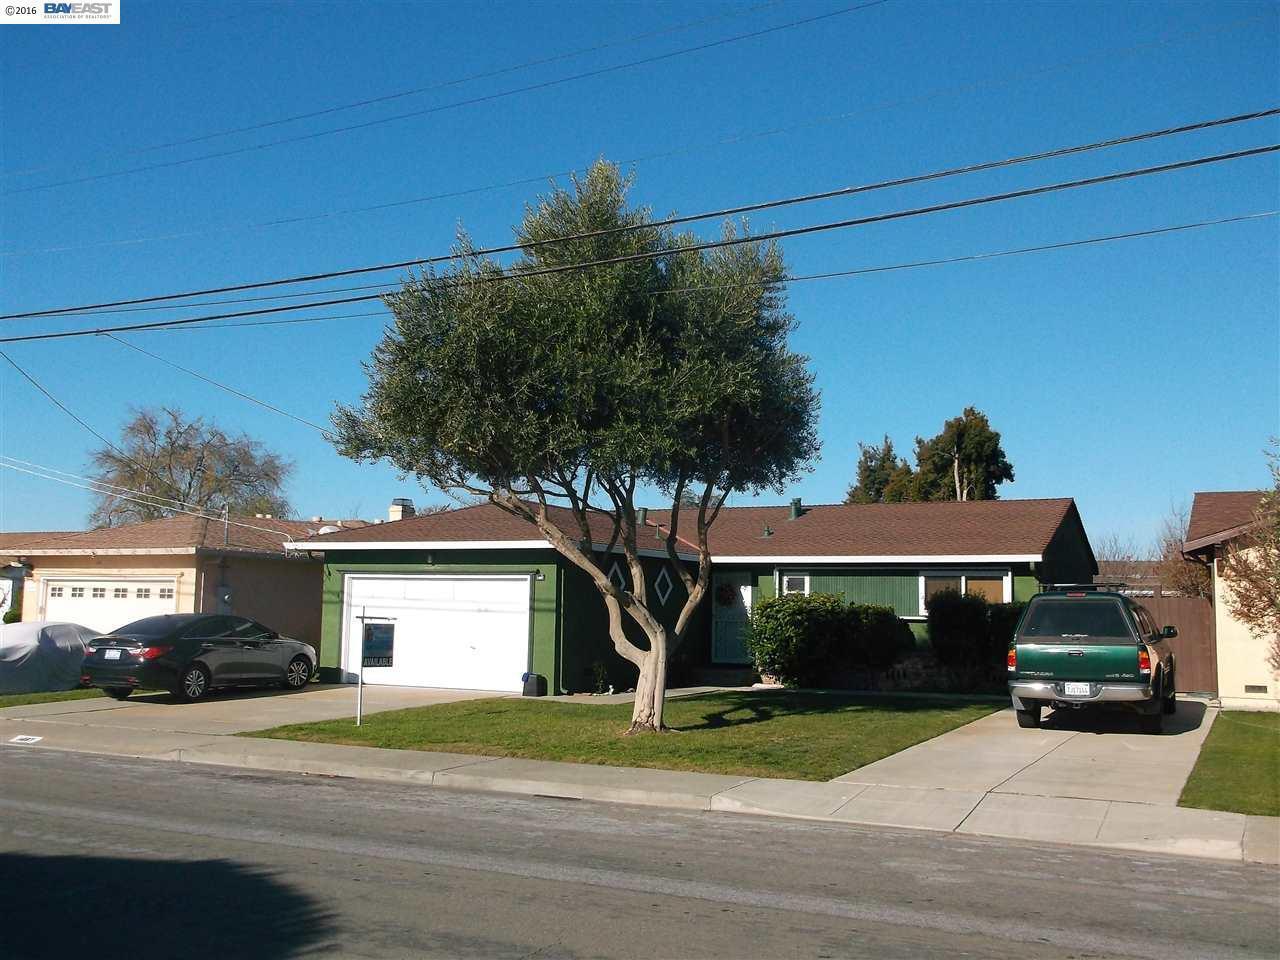 1487 Via Escondido, San Lorenzo, CA 94580 | MLS# 40766125 | Redfin